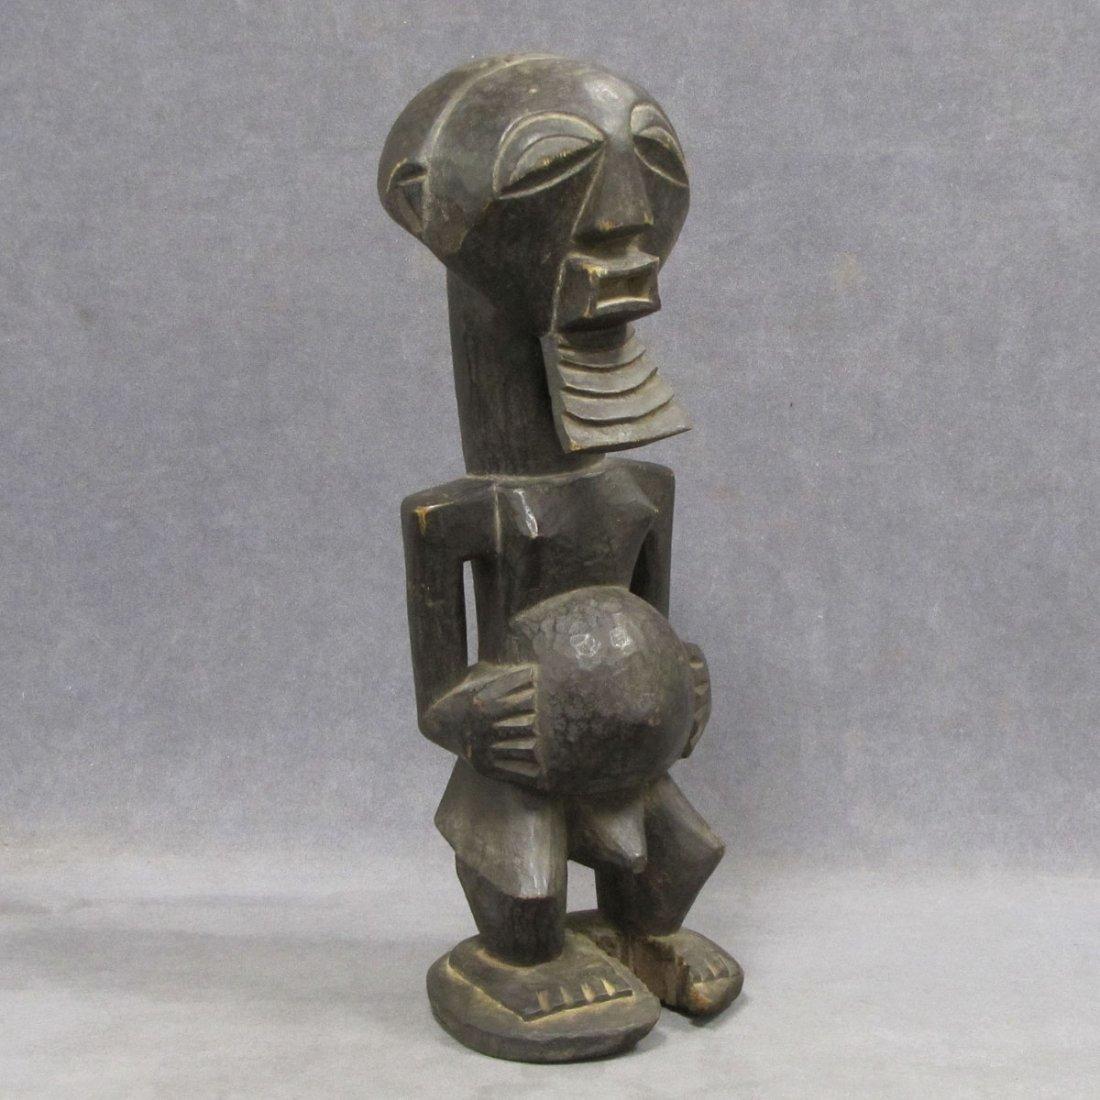 Songye, Congo Carved Male Figure